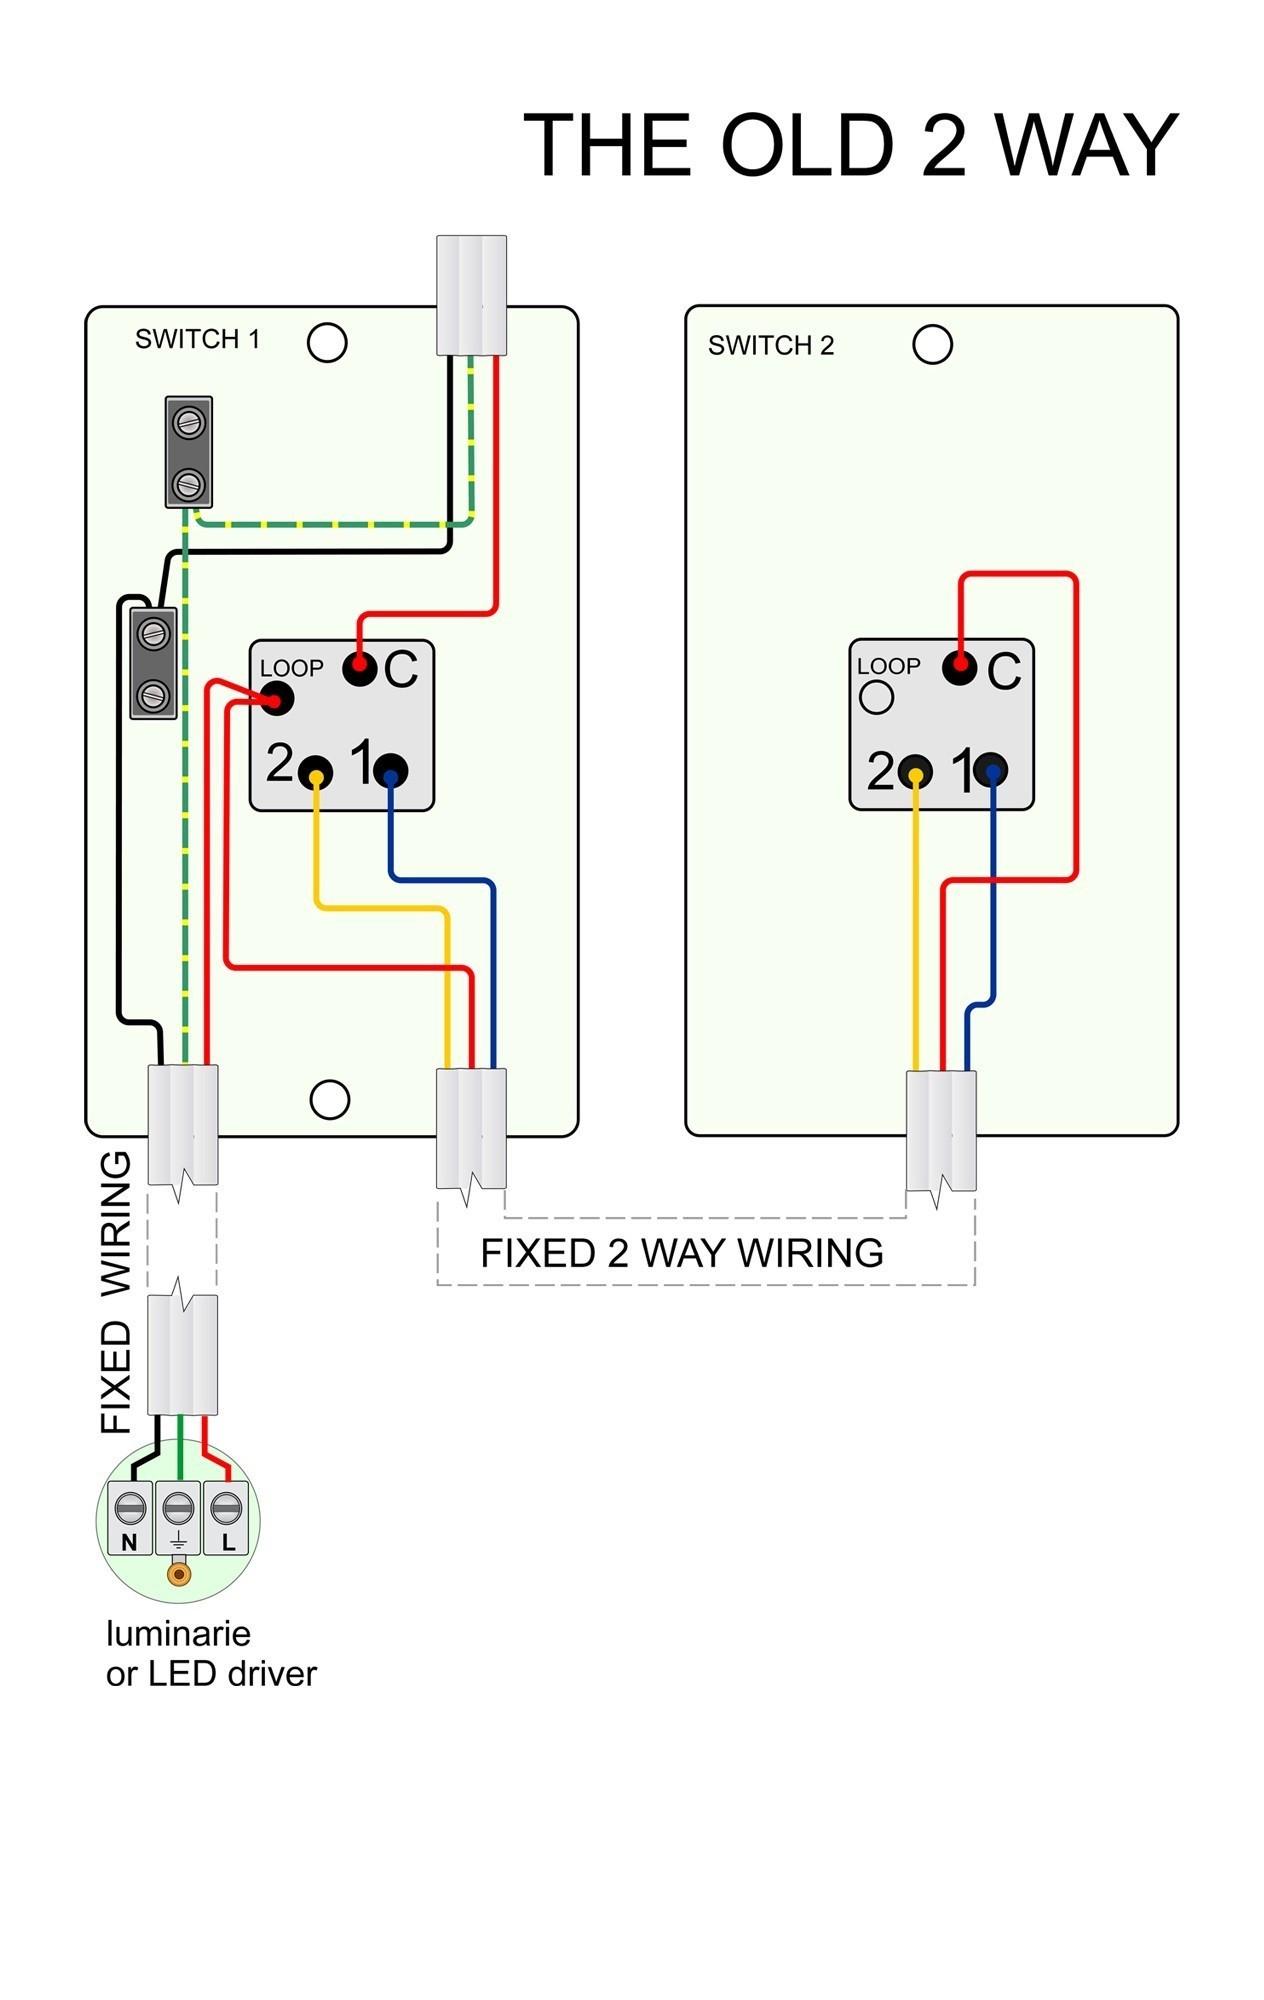 Dimmer Switch Wiring Diagram Best Two Way Switch Wiring Diagram Nz New Light In 2